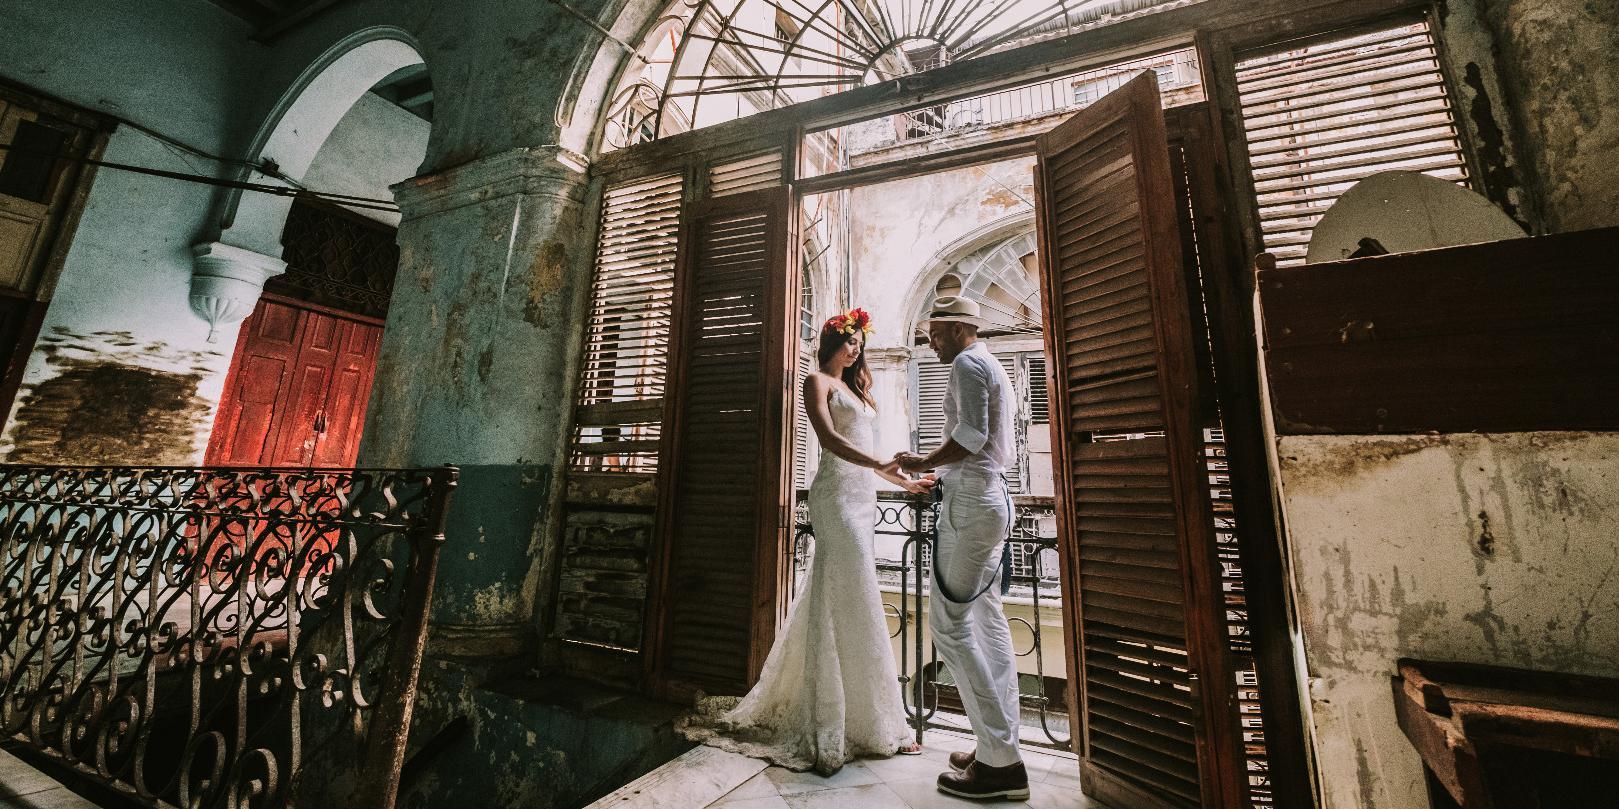 bodas-sin-clasificar-sin-tema-cuba-28921.jpg